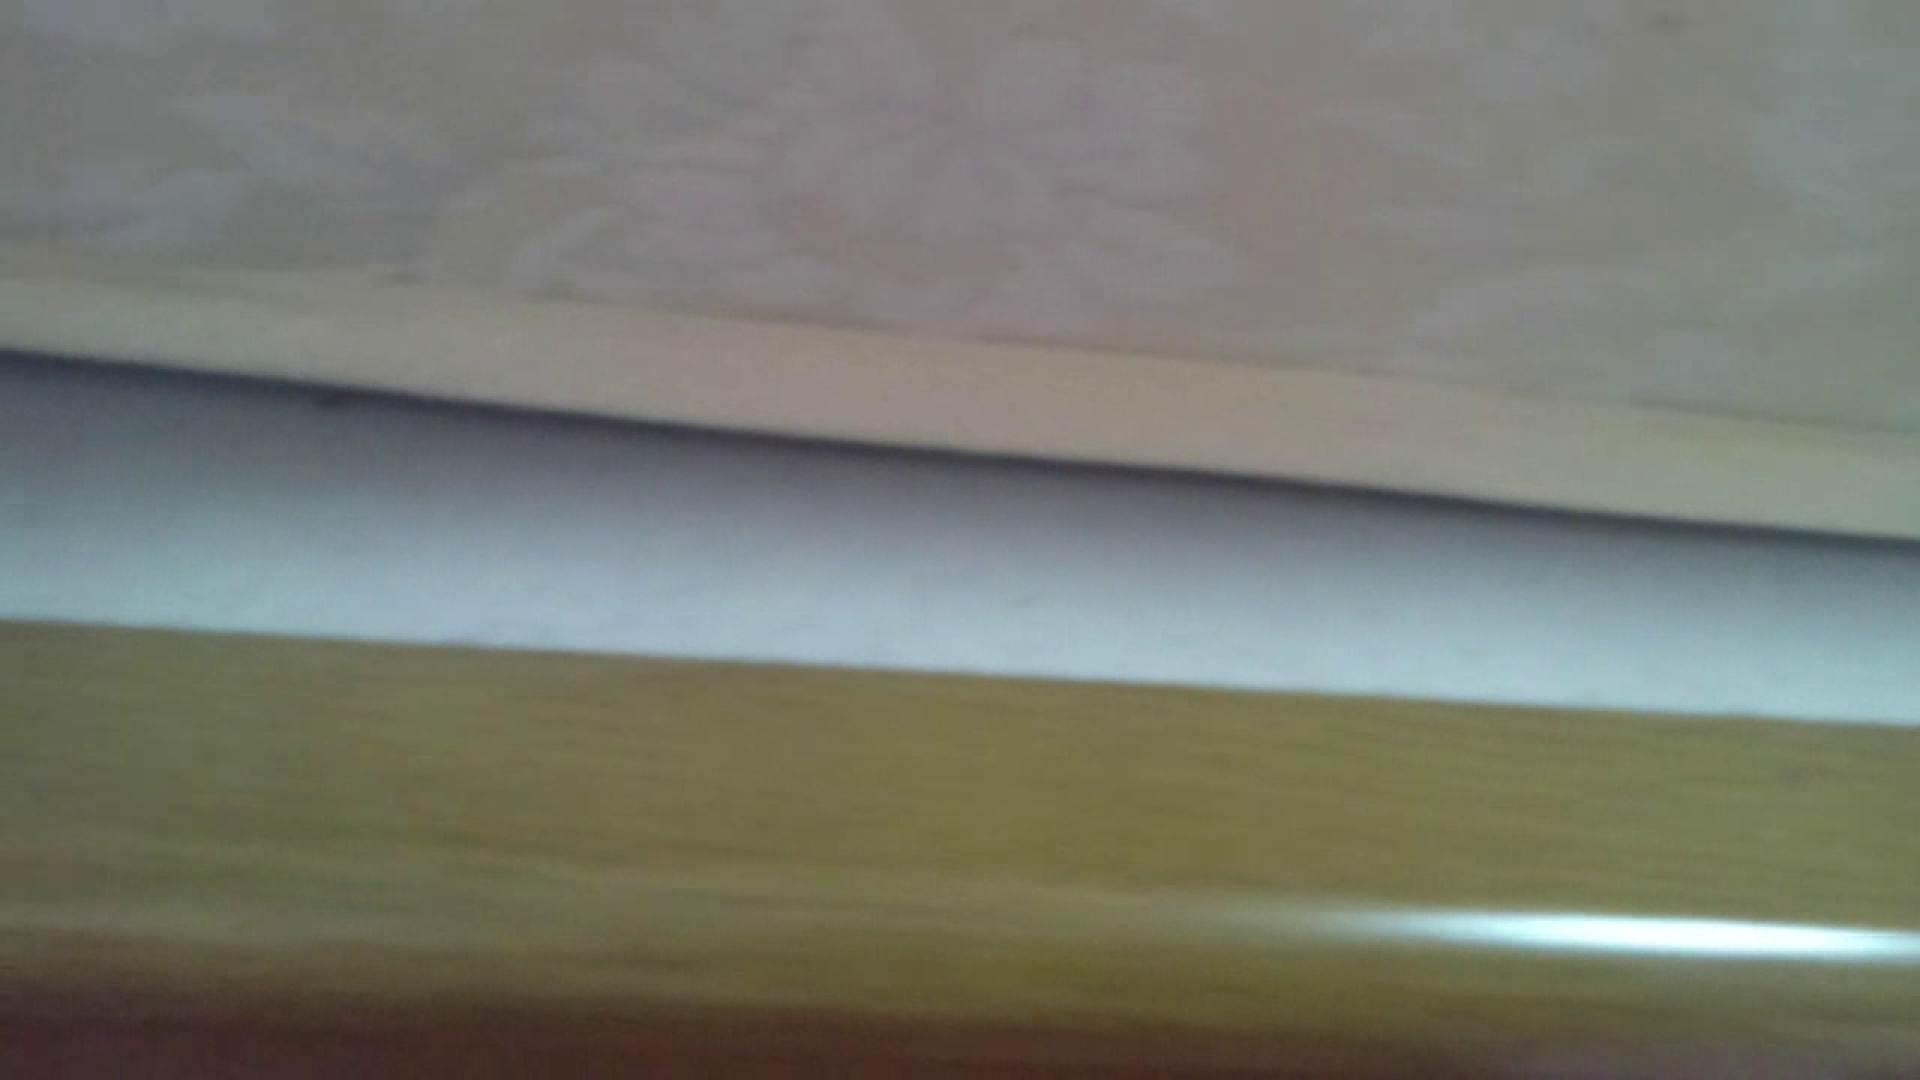 vol.5 自宅の部屋を撮って来てもらいました。 OLヌード天国  73PIX 32